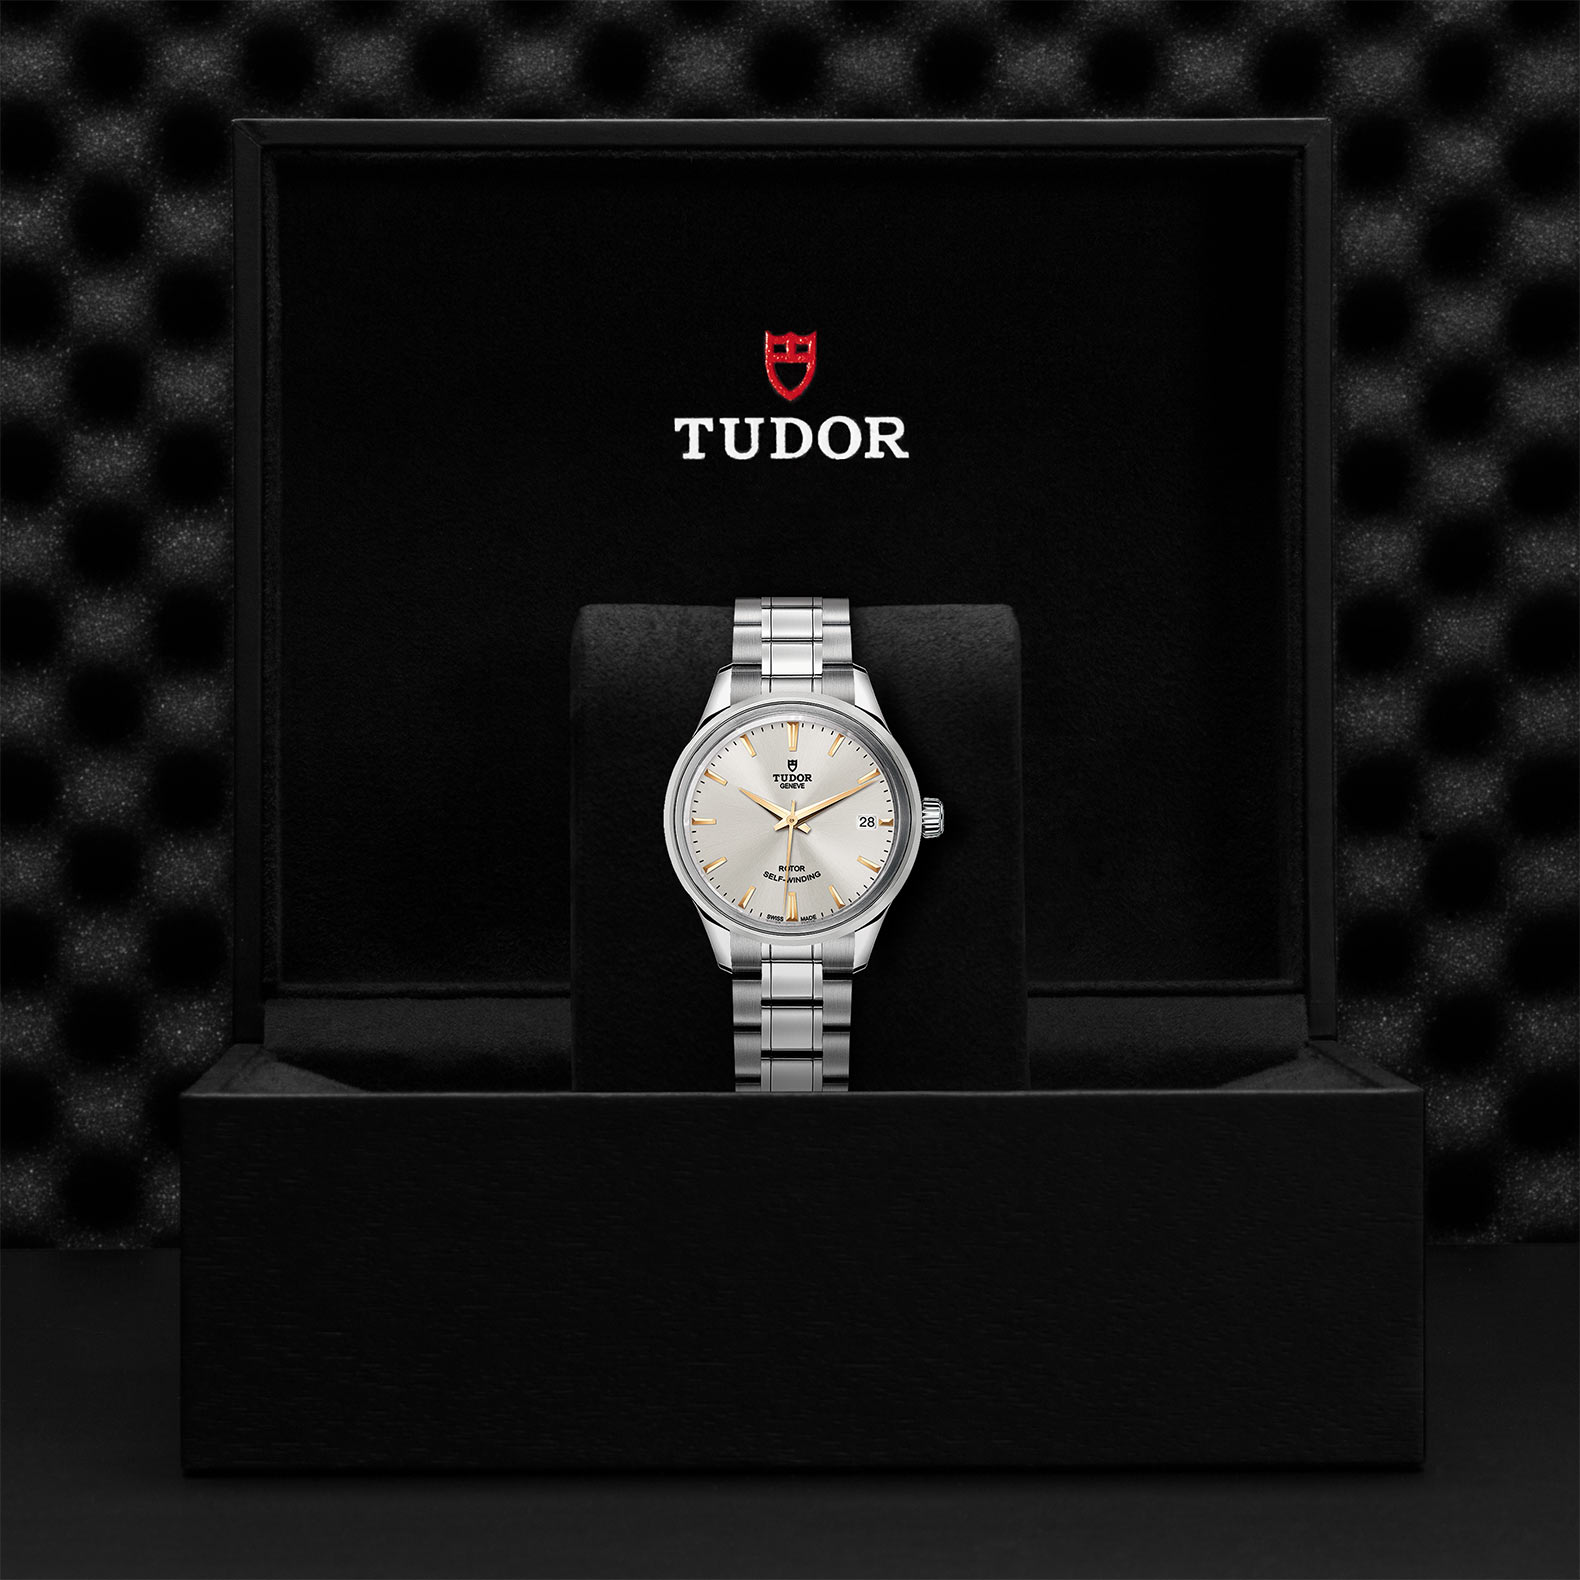 TUDOR Style M12300 0017 Presentationbox